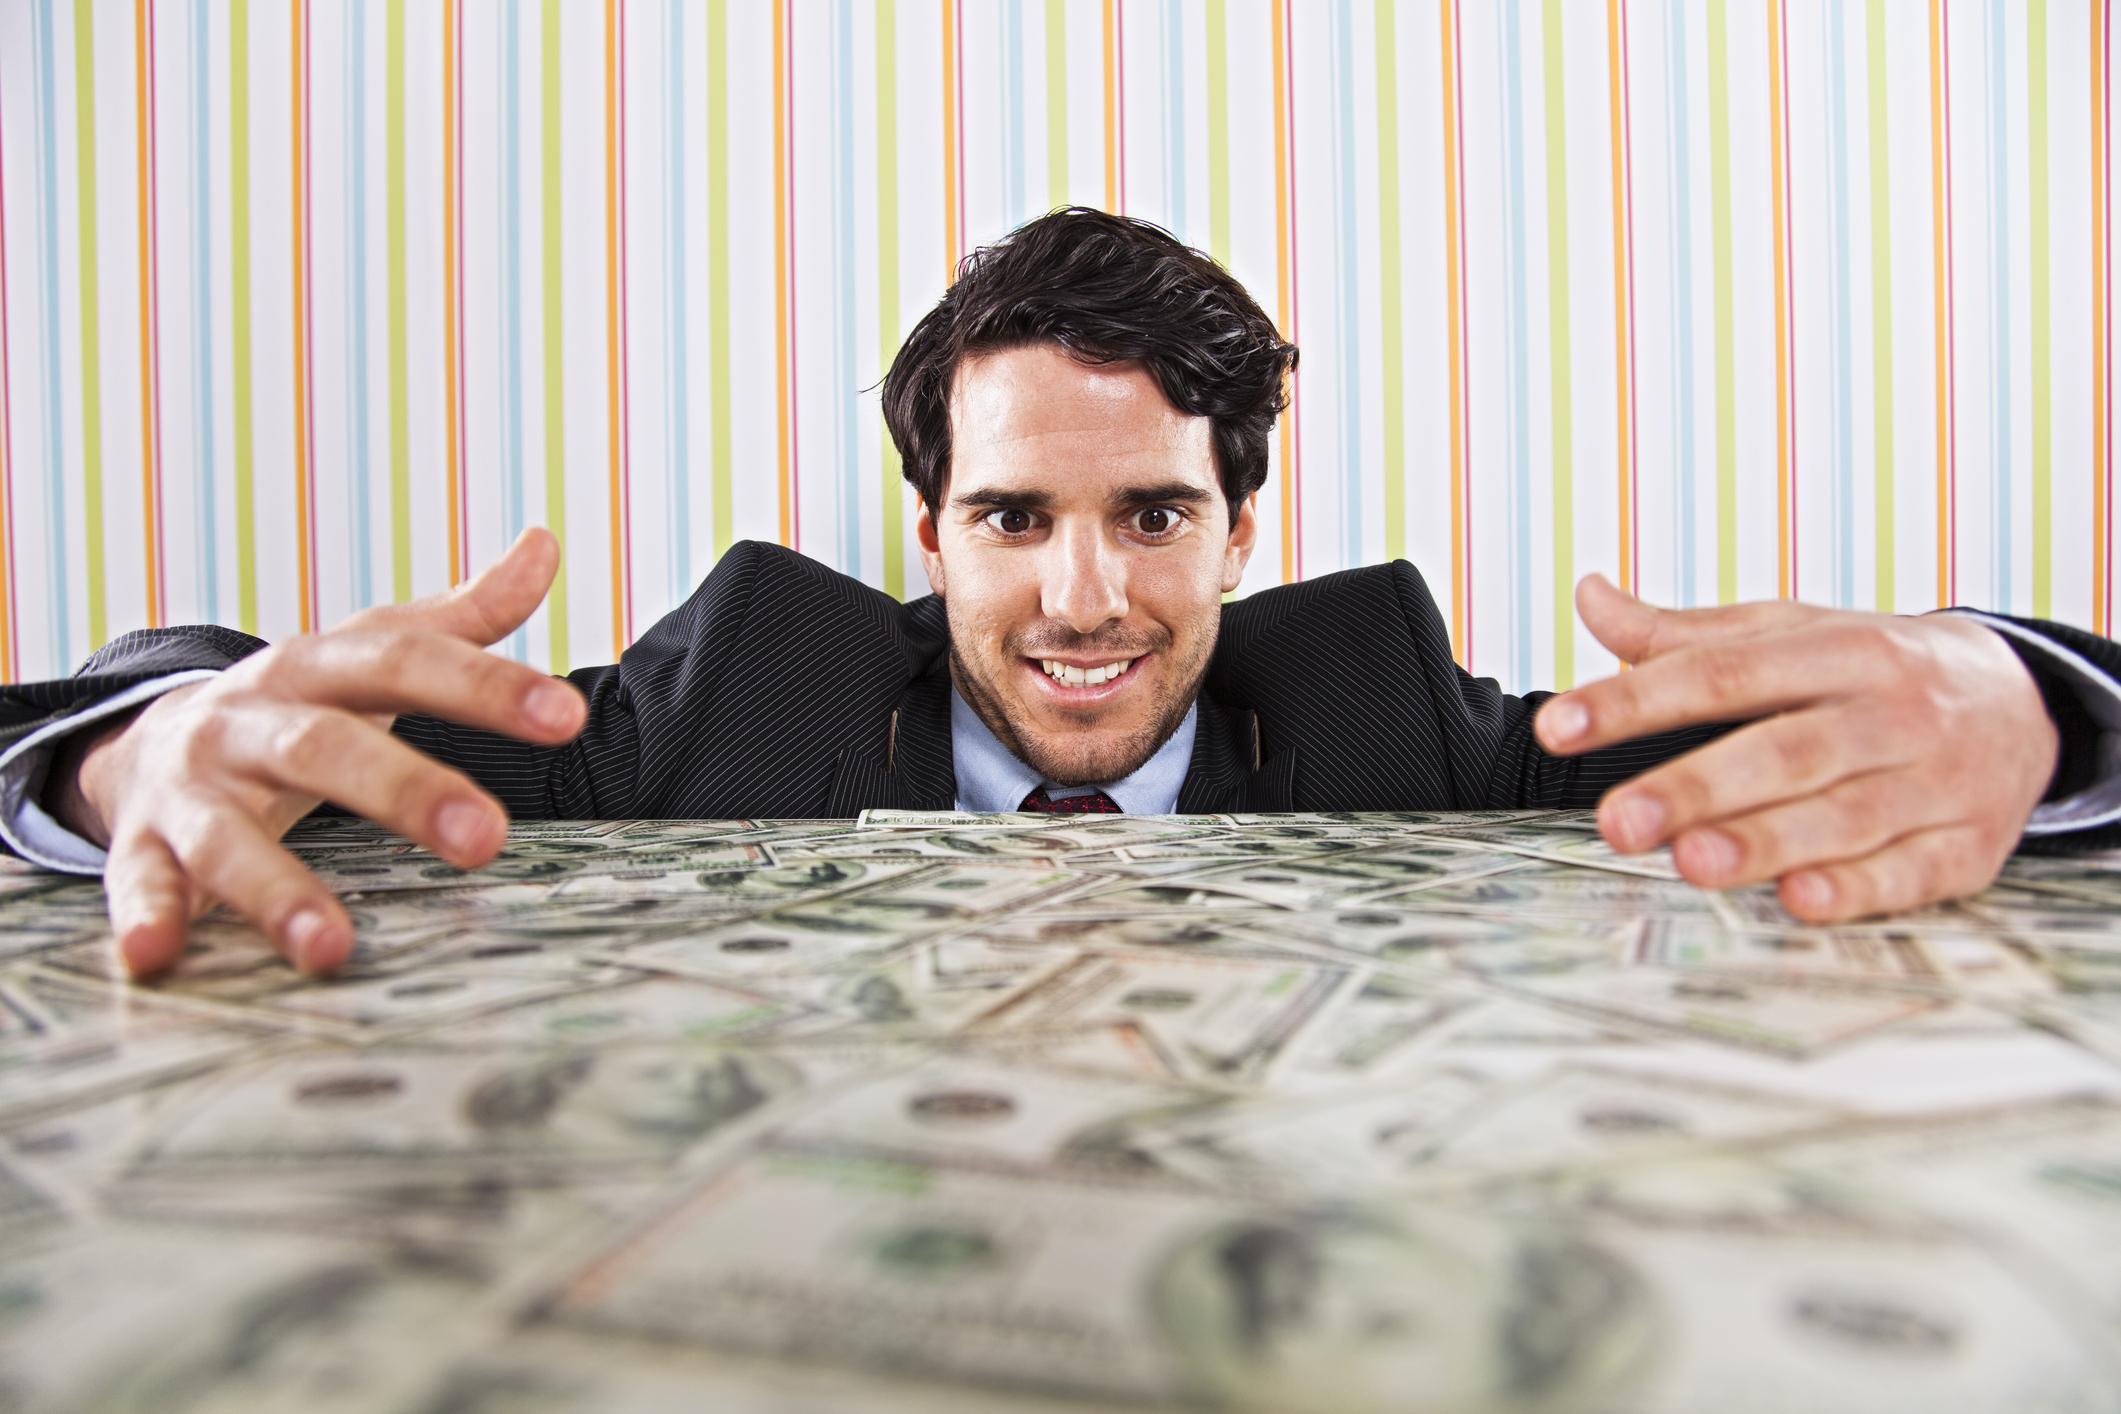 A man in a suit staring at a pile of cash on a table.